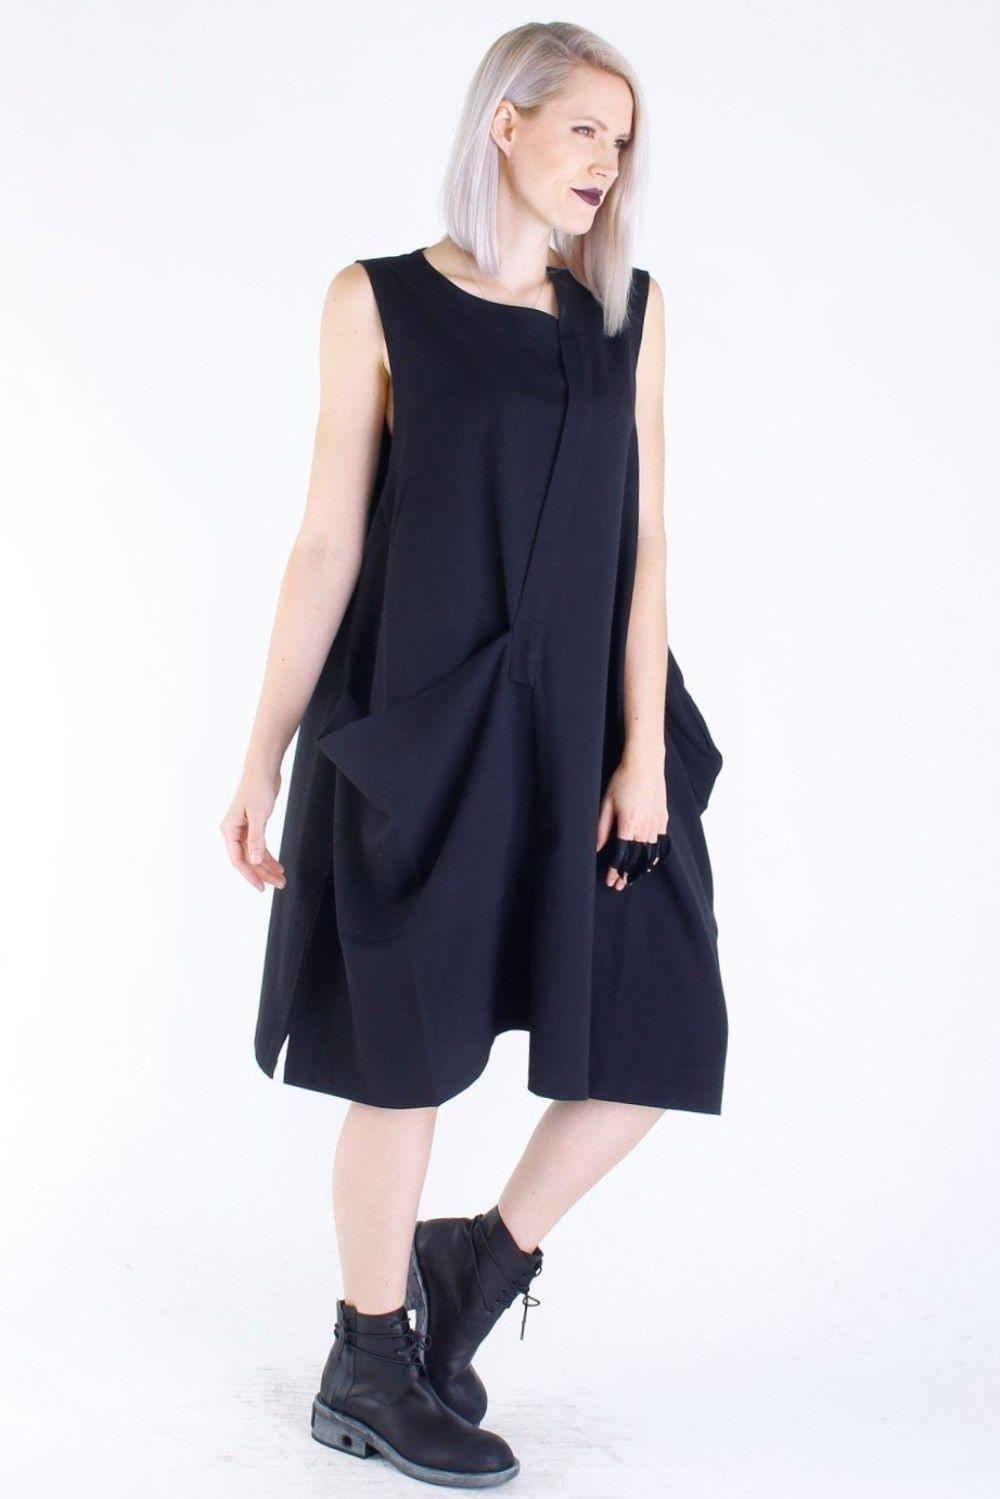 15 Großartig Damenkleider Elegant Stylish17 Schön Damenkleider Elegant Boutique